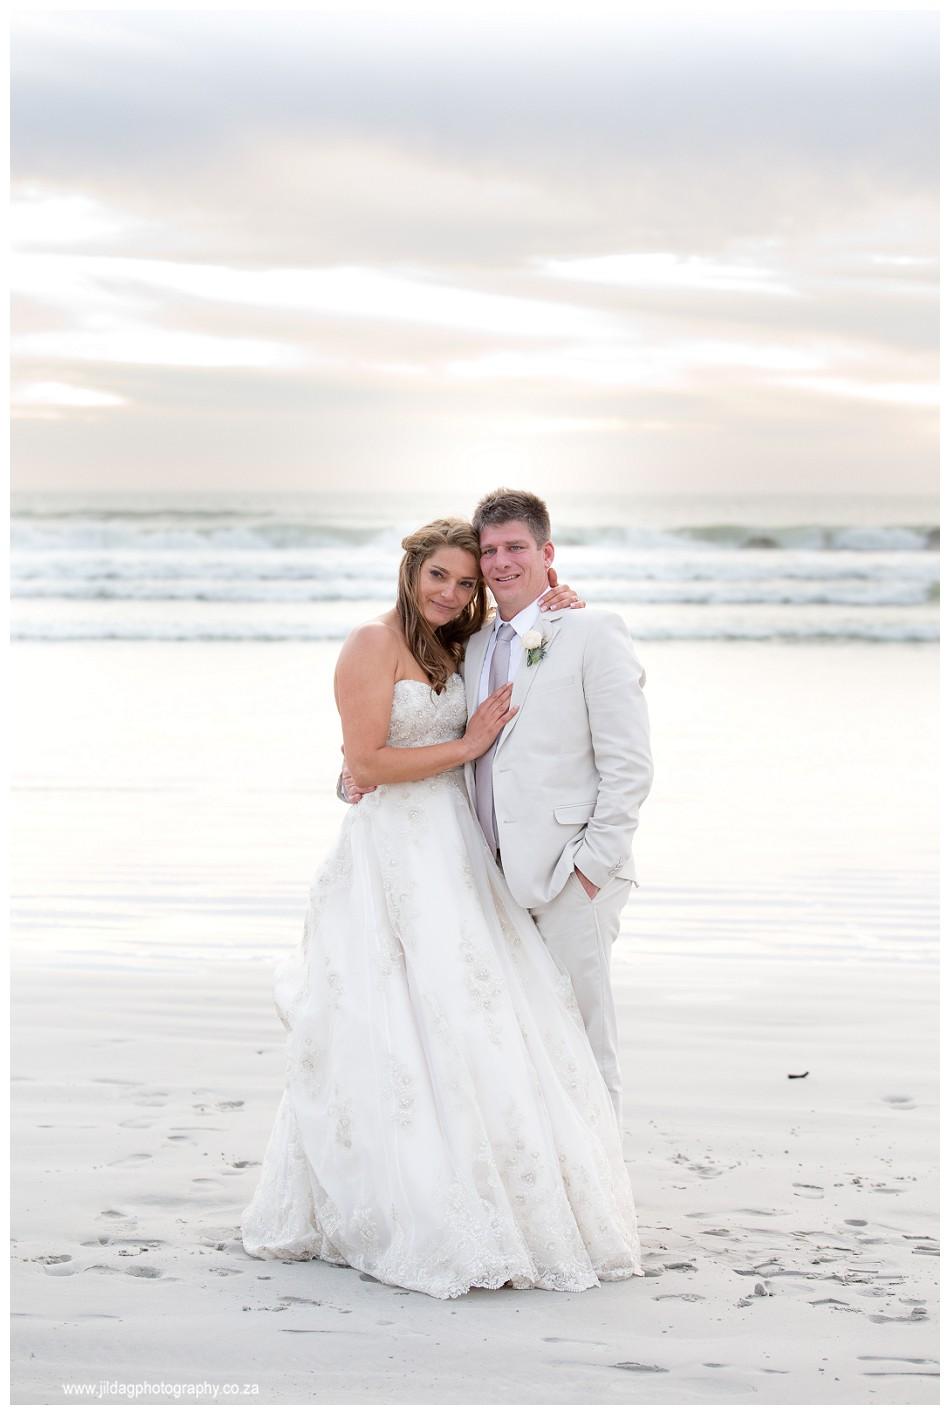 Strandkombuis - Beach wedding - Jilda G Photography (91)